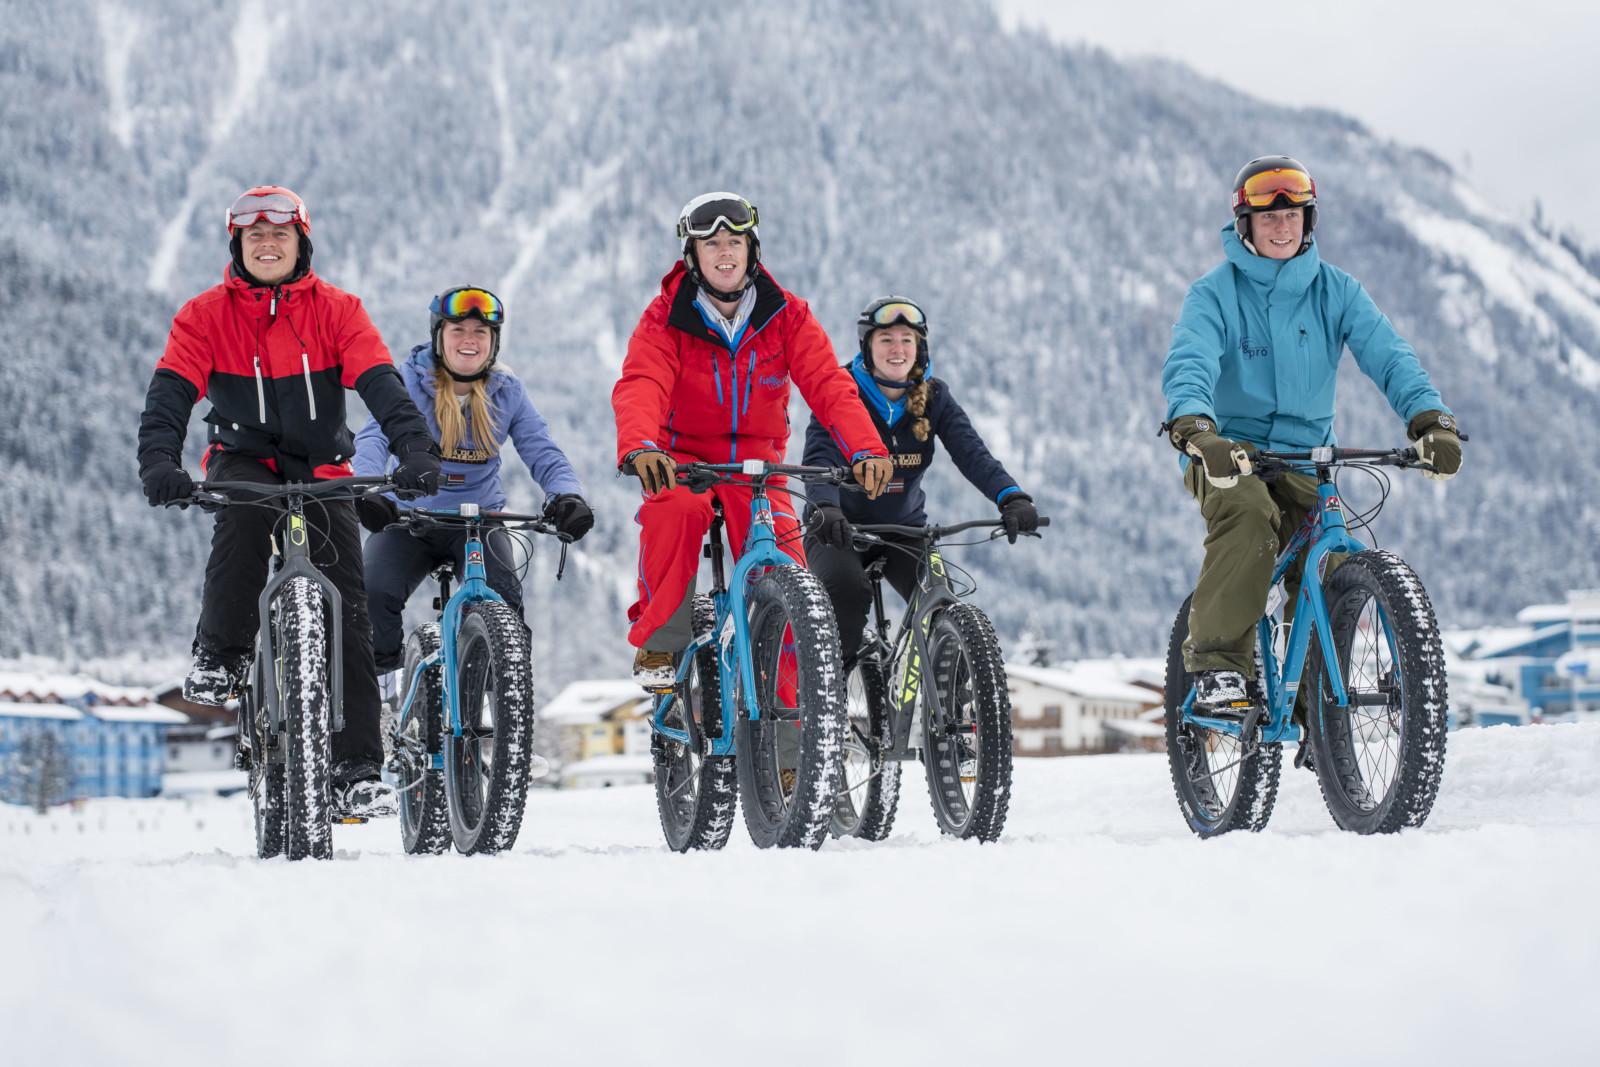 fun&pro bietet geführte Fatbike Touren (c)wildbild/Kirchmaier